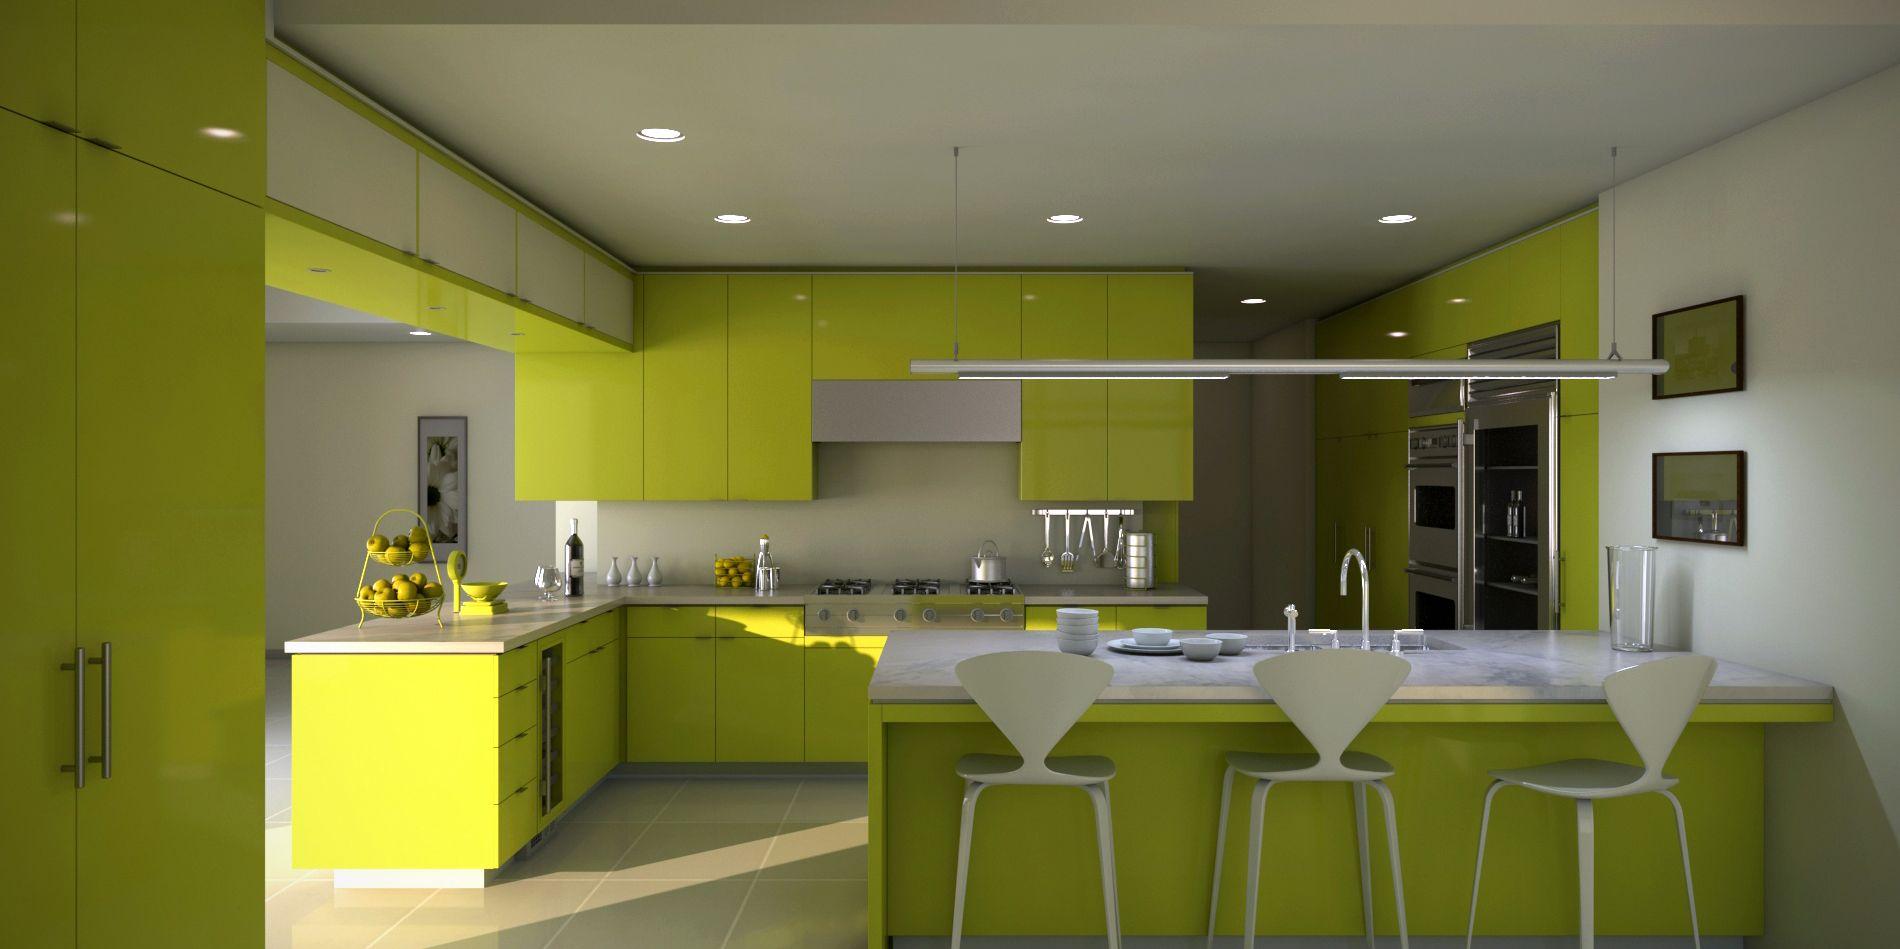 green kitchen cabinets design photos ideas u inspiration